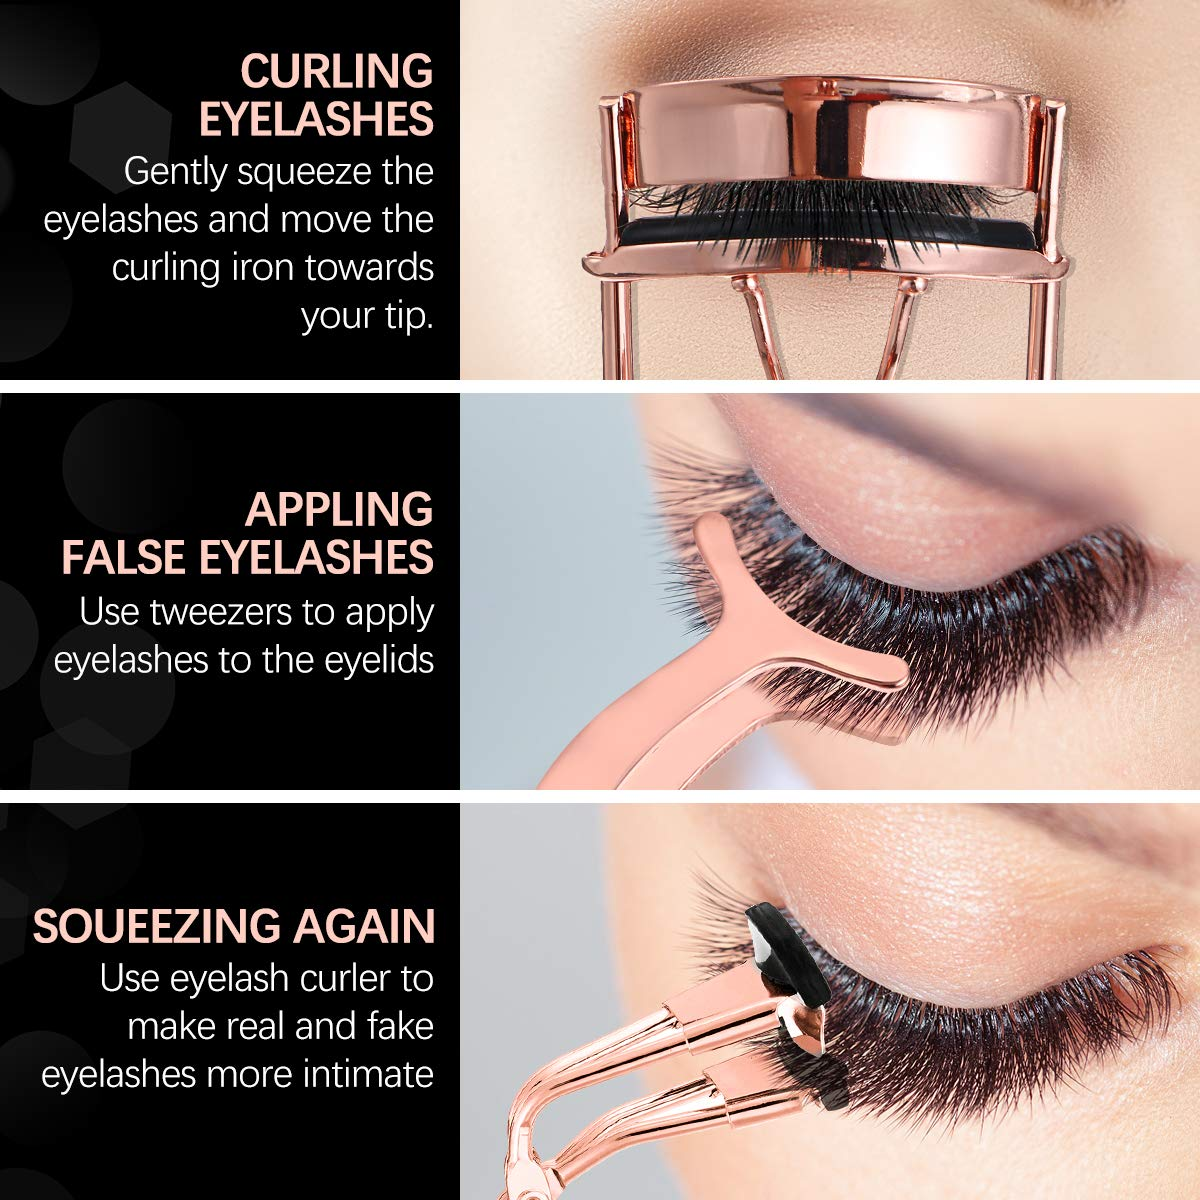 Eyelash Curler Kit for Women, Liaboe Mini Eyelash Makeup Tools Set with 2 Pieces Eyelash Curle, False Eyelashes Extension Tweezers, and Scissors, Mini Eyelash Curler fits All Eye Shape (Rose Gold) : Beauty